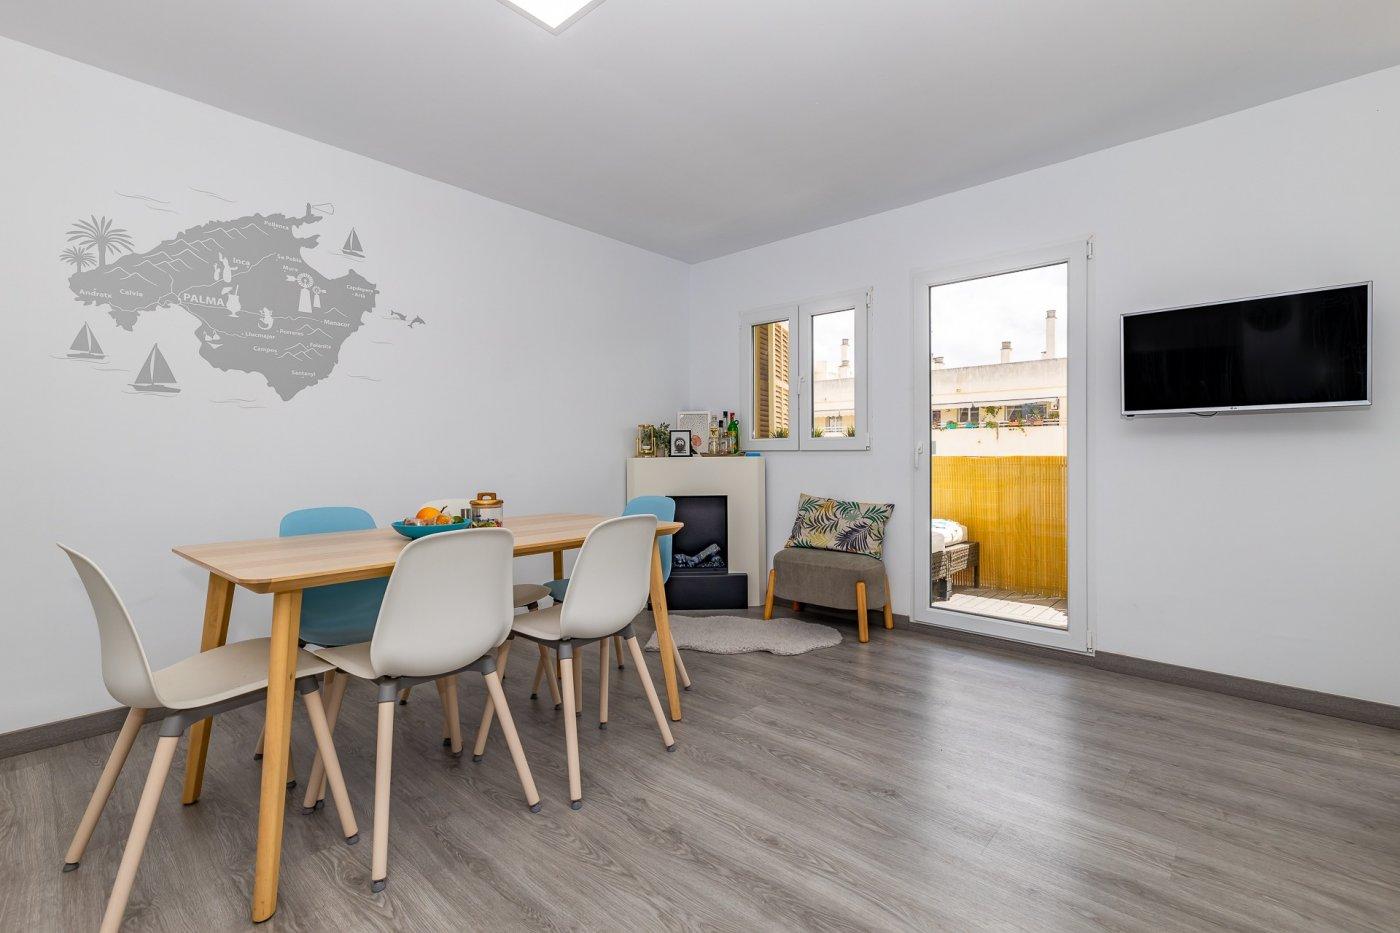 Acogedor piso en zona foners, palma - imagenInmueble3